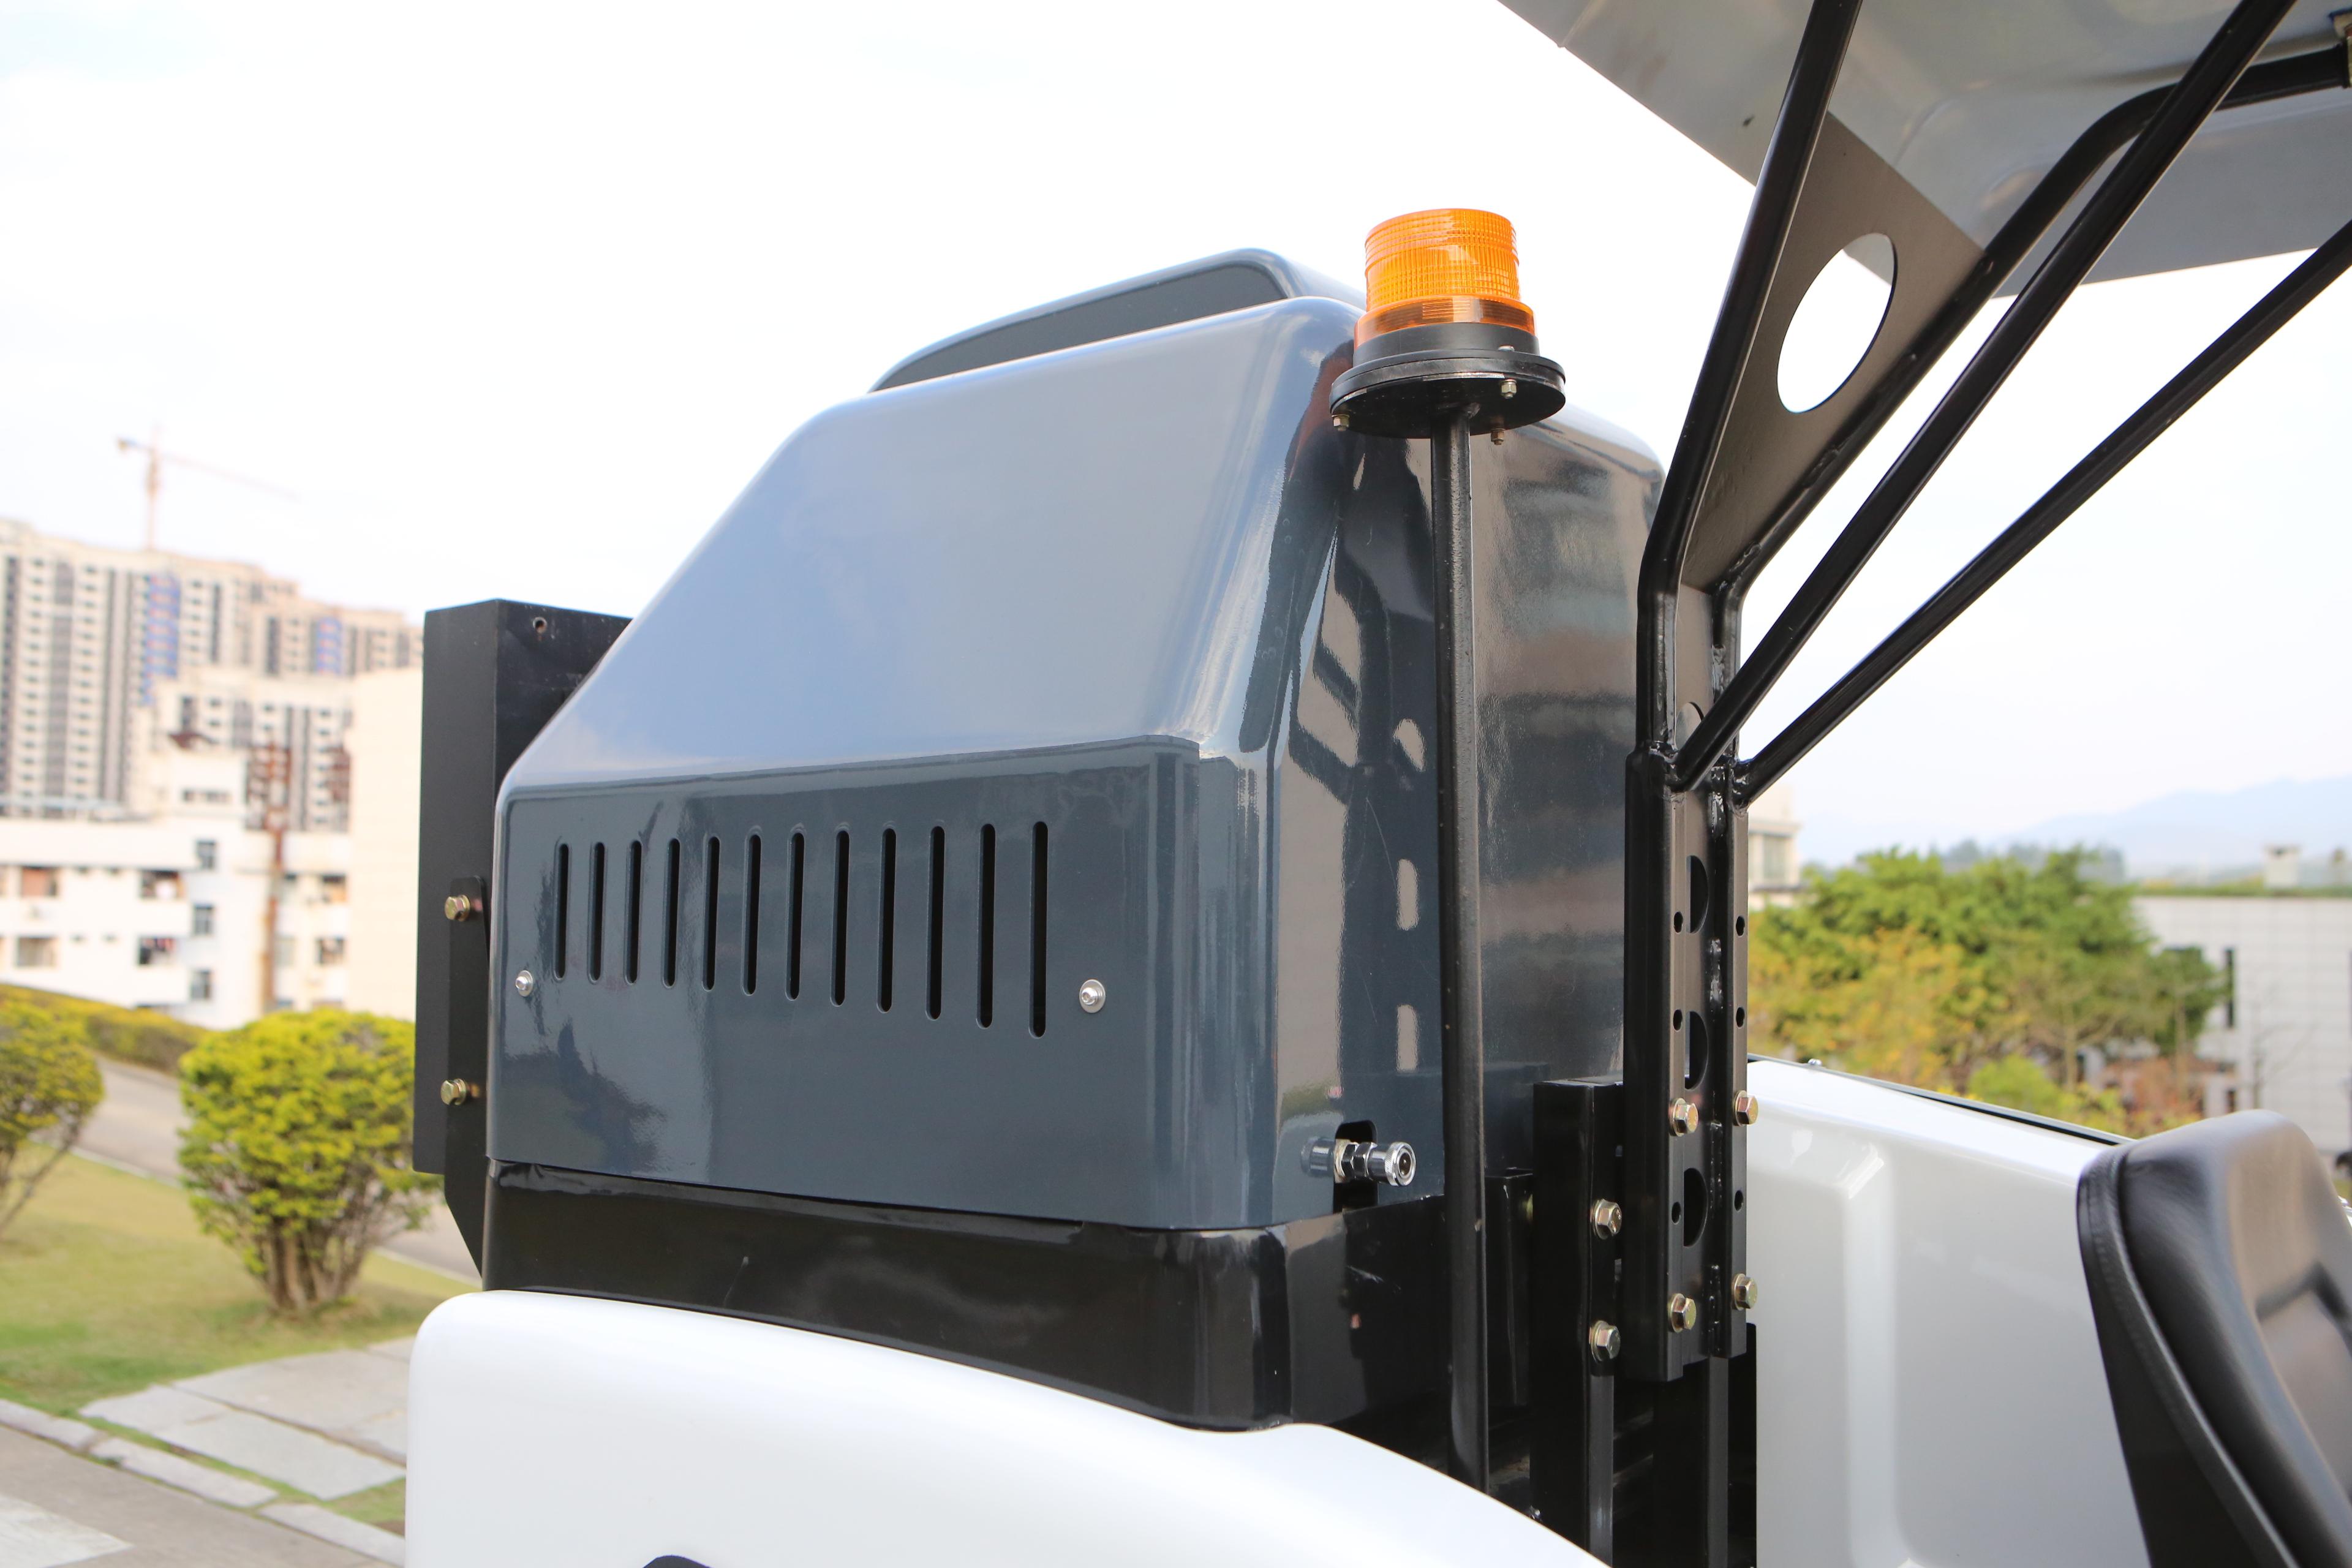 FLMSD13纯电动桶装人行道扫路机